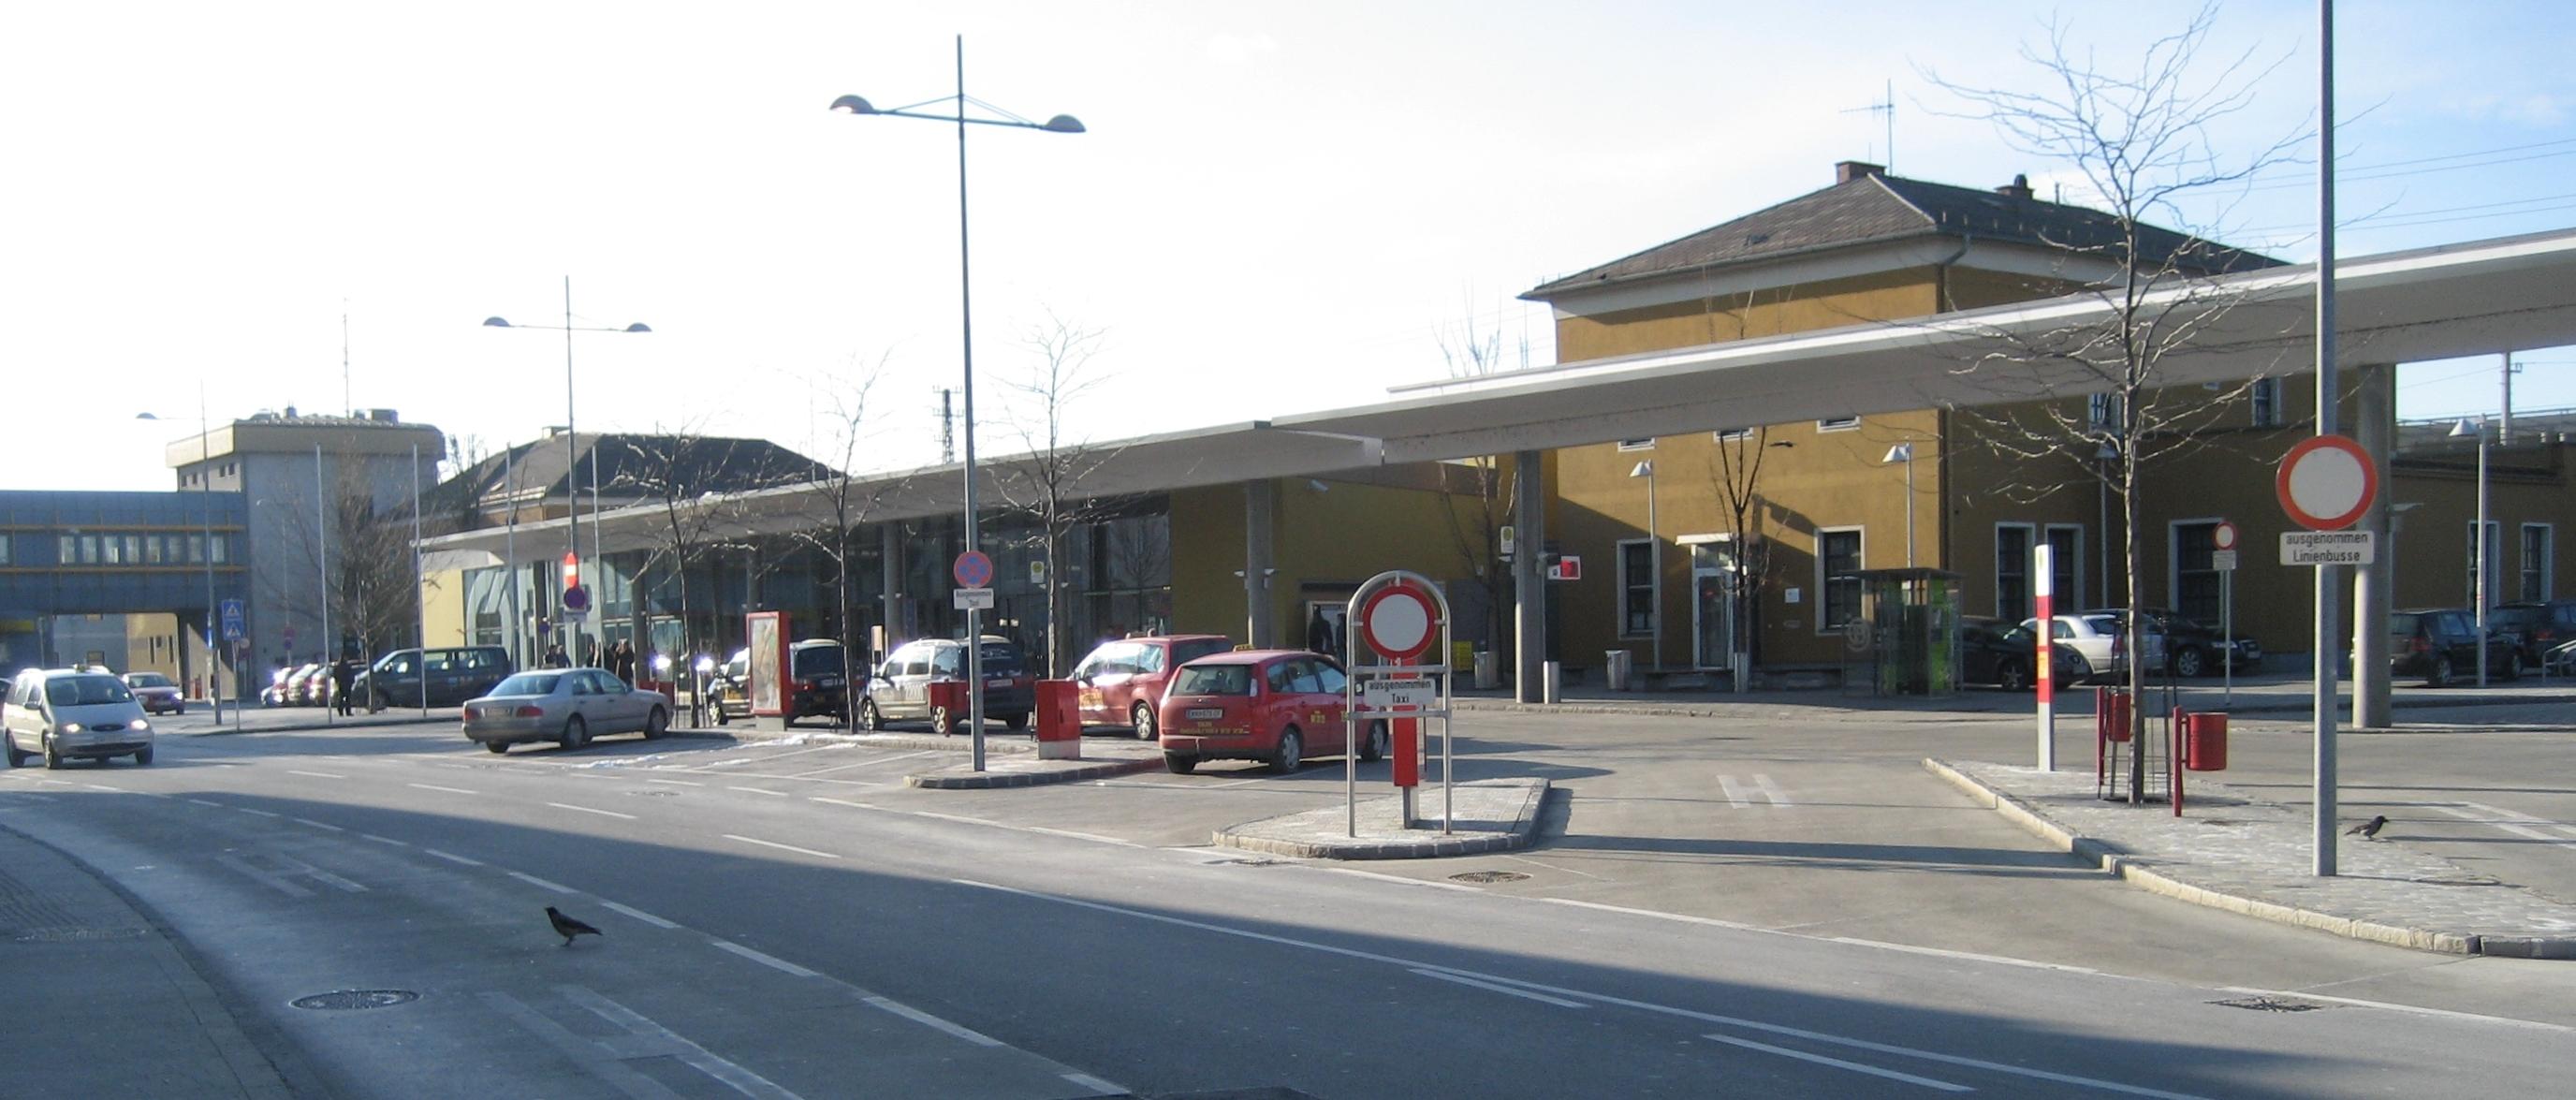 FileWiener Neustadt Hauptbahnhof03jpg  Wikimedia Commons